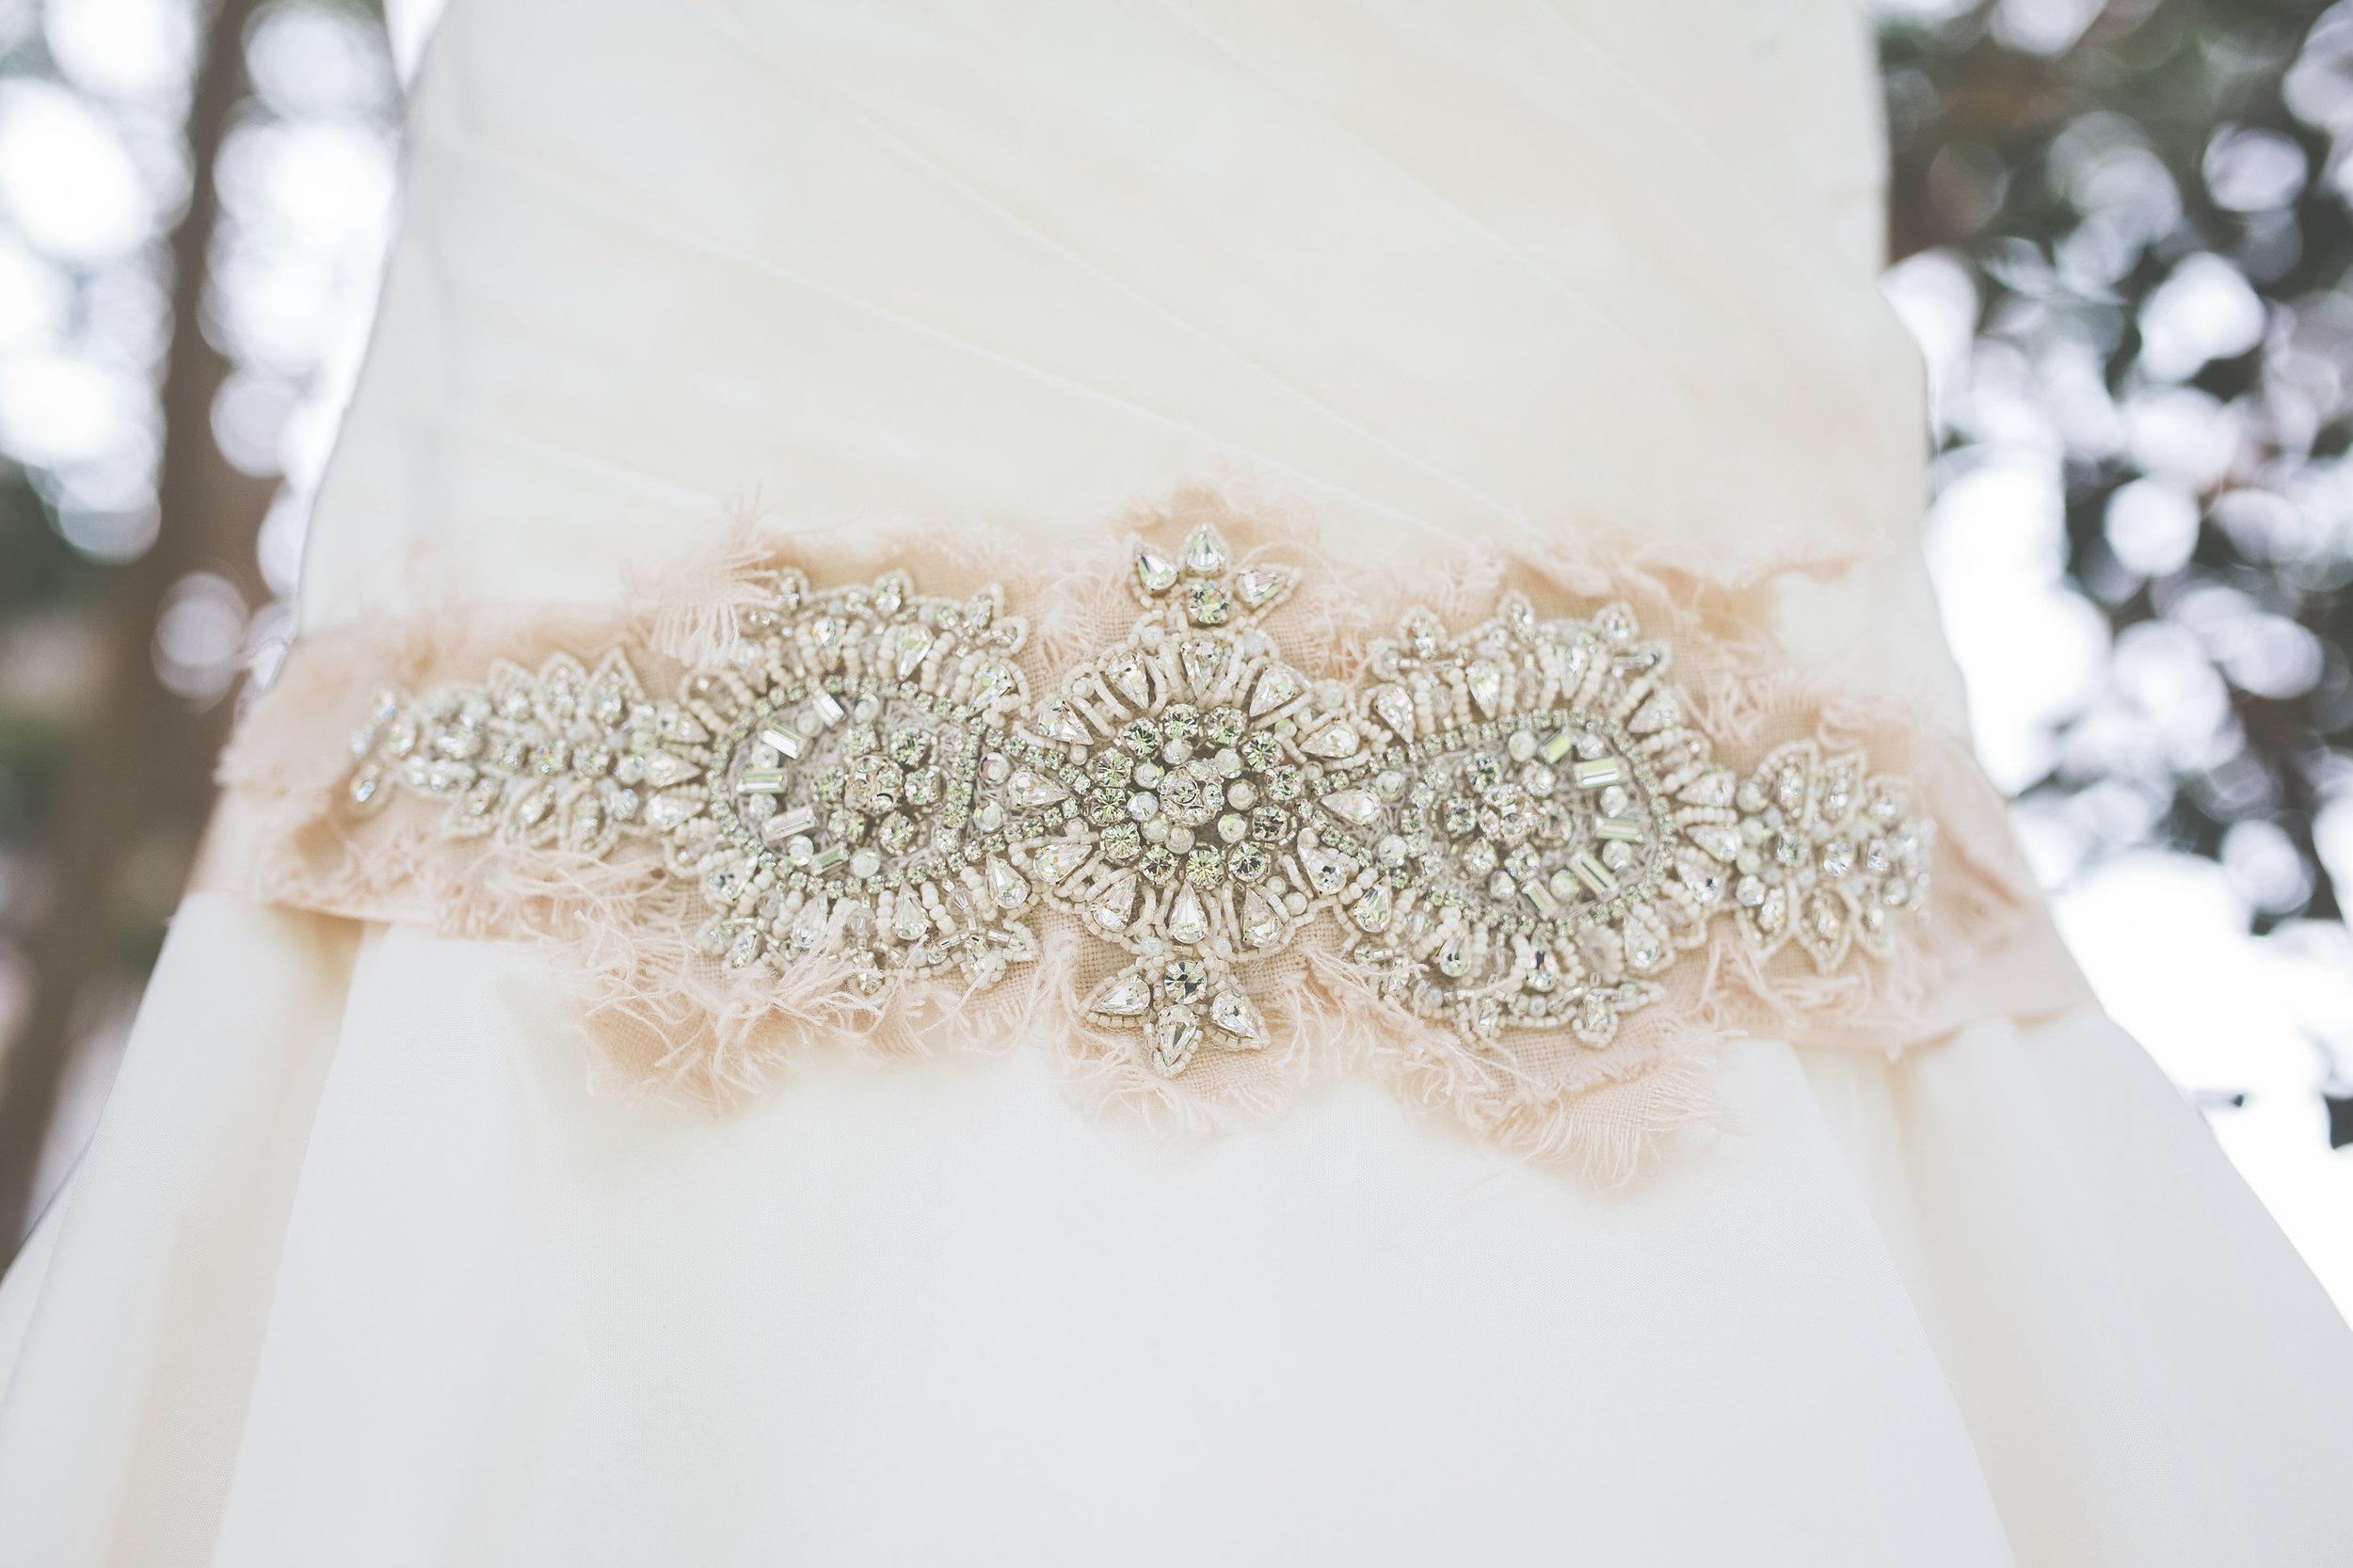 Romona Keveza wedding dress from Maddison Row